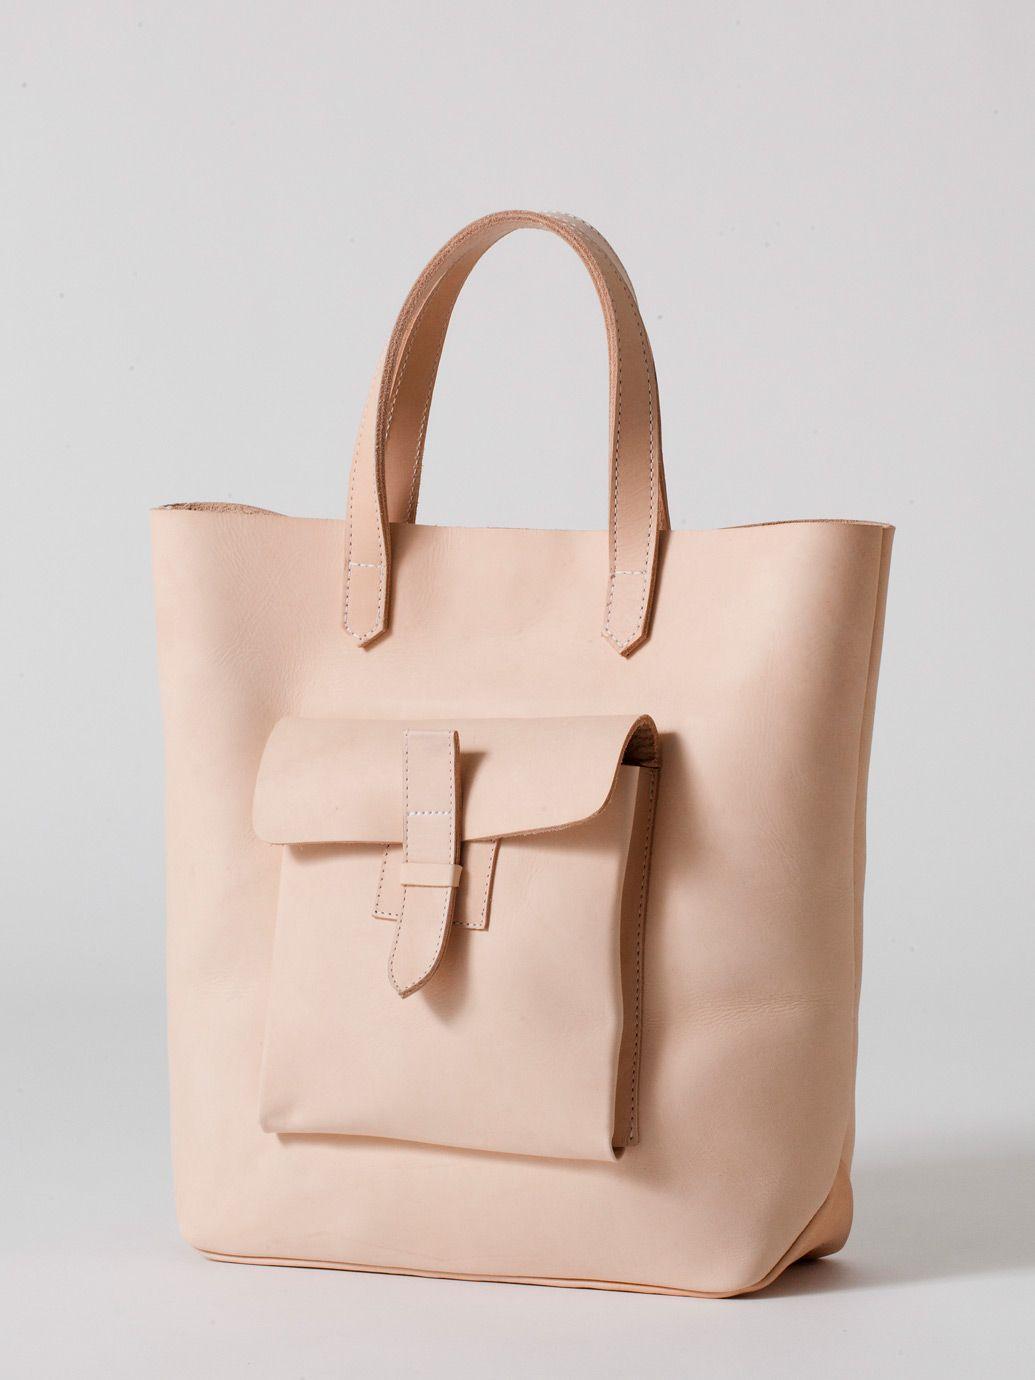 Perfect Handbag For School